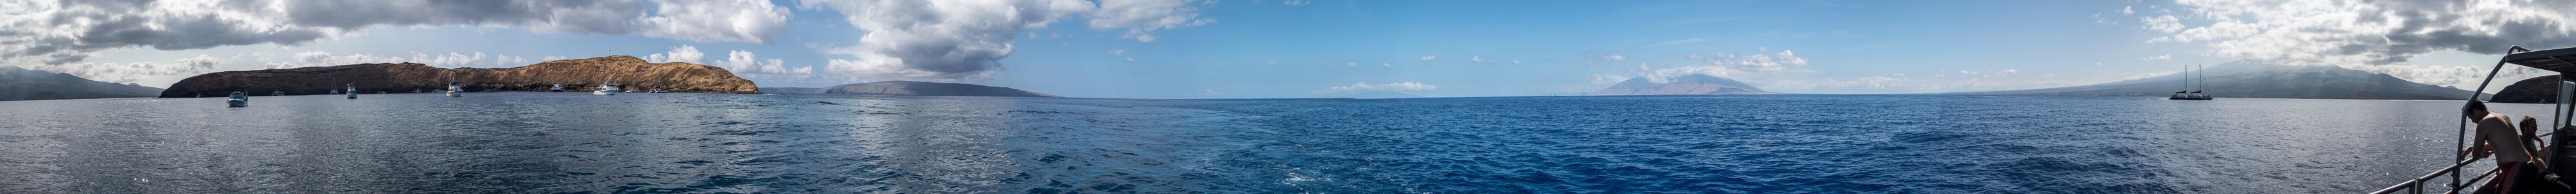 Pazifik. V.l.: Maui, Molokini Crater, Kahoolawe, Lanai, Maui mit den West Maui Mountains und dem Haleakala Molokini